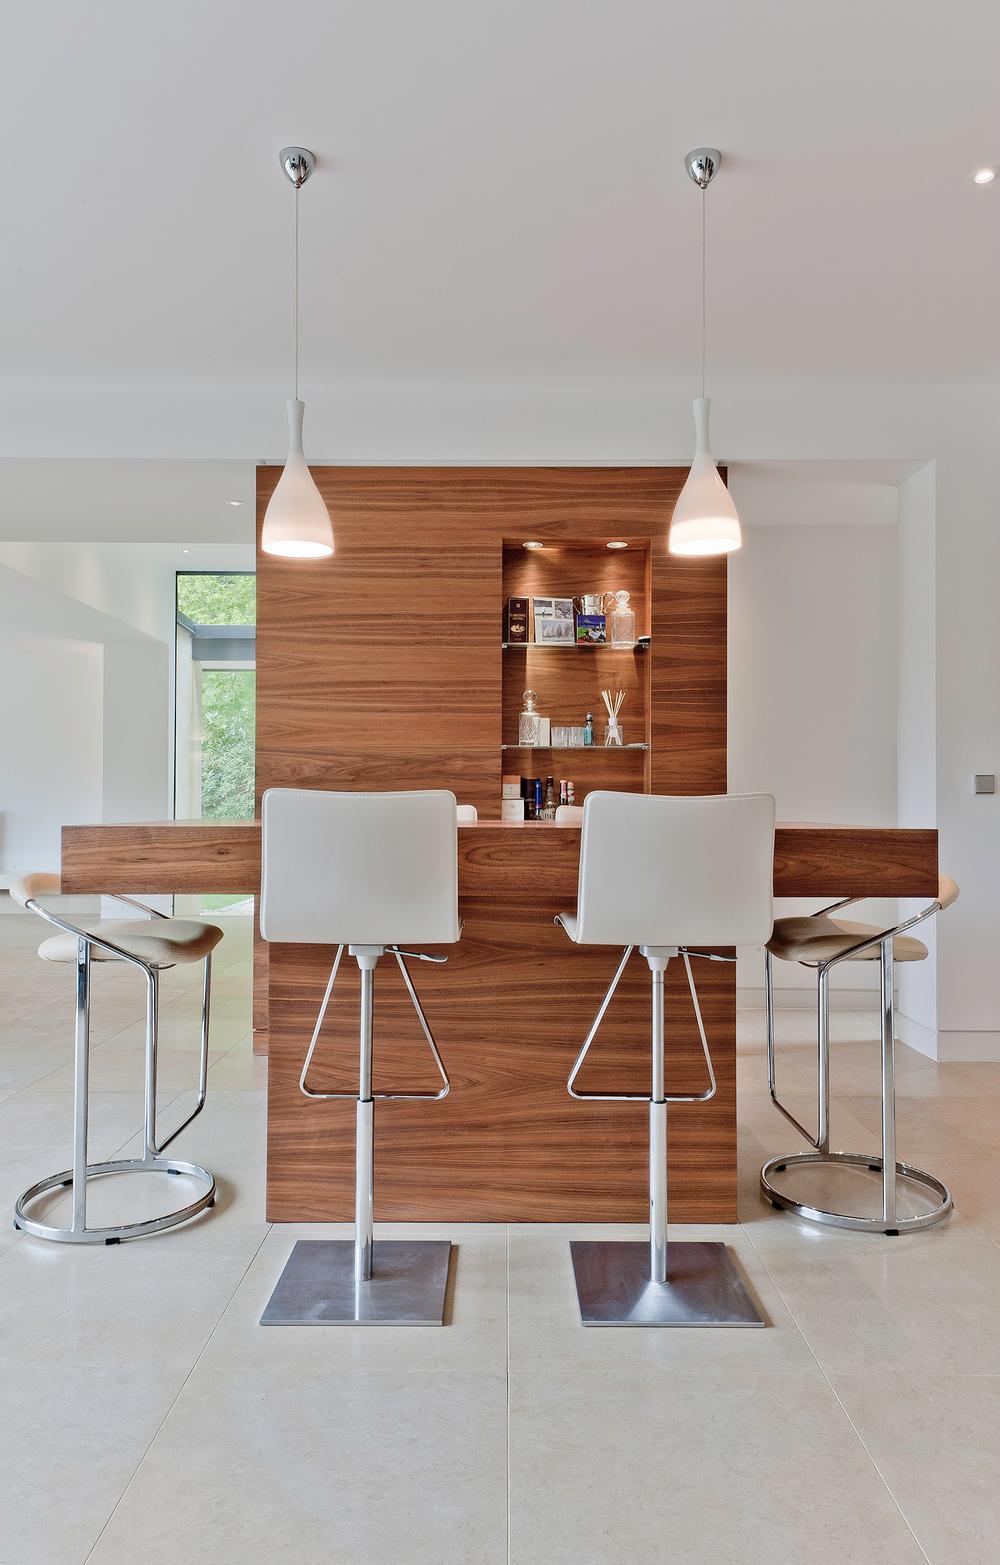 _interior-photography-residential-dorset-mileride-6.jpg